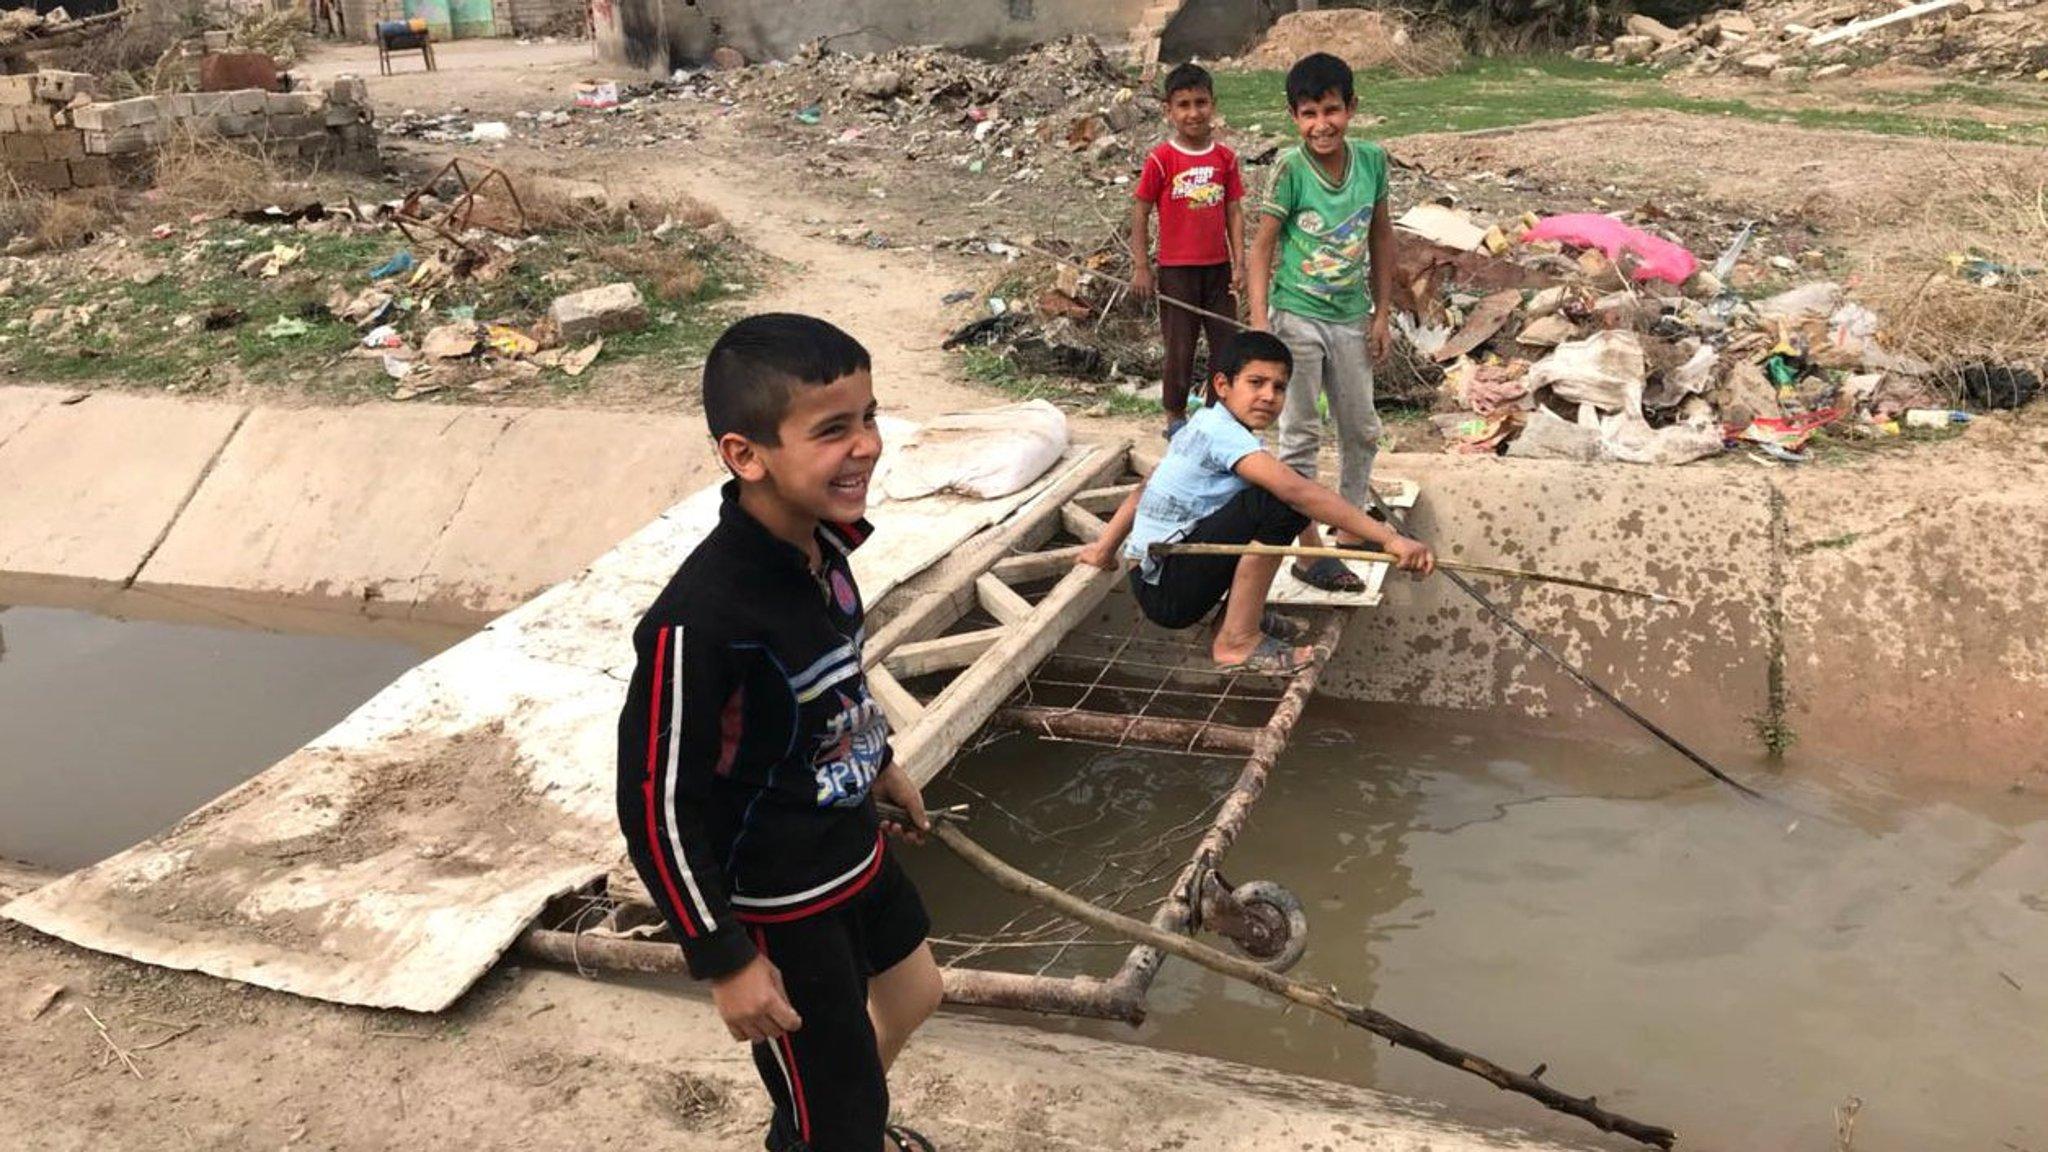 Sunni and Shia struggle with Iraq's reconciliation process